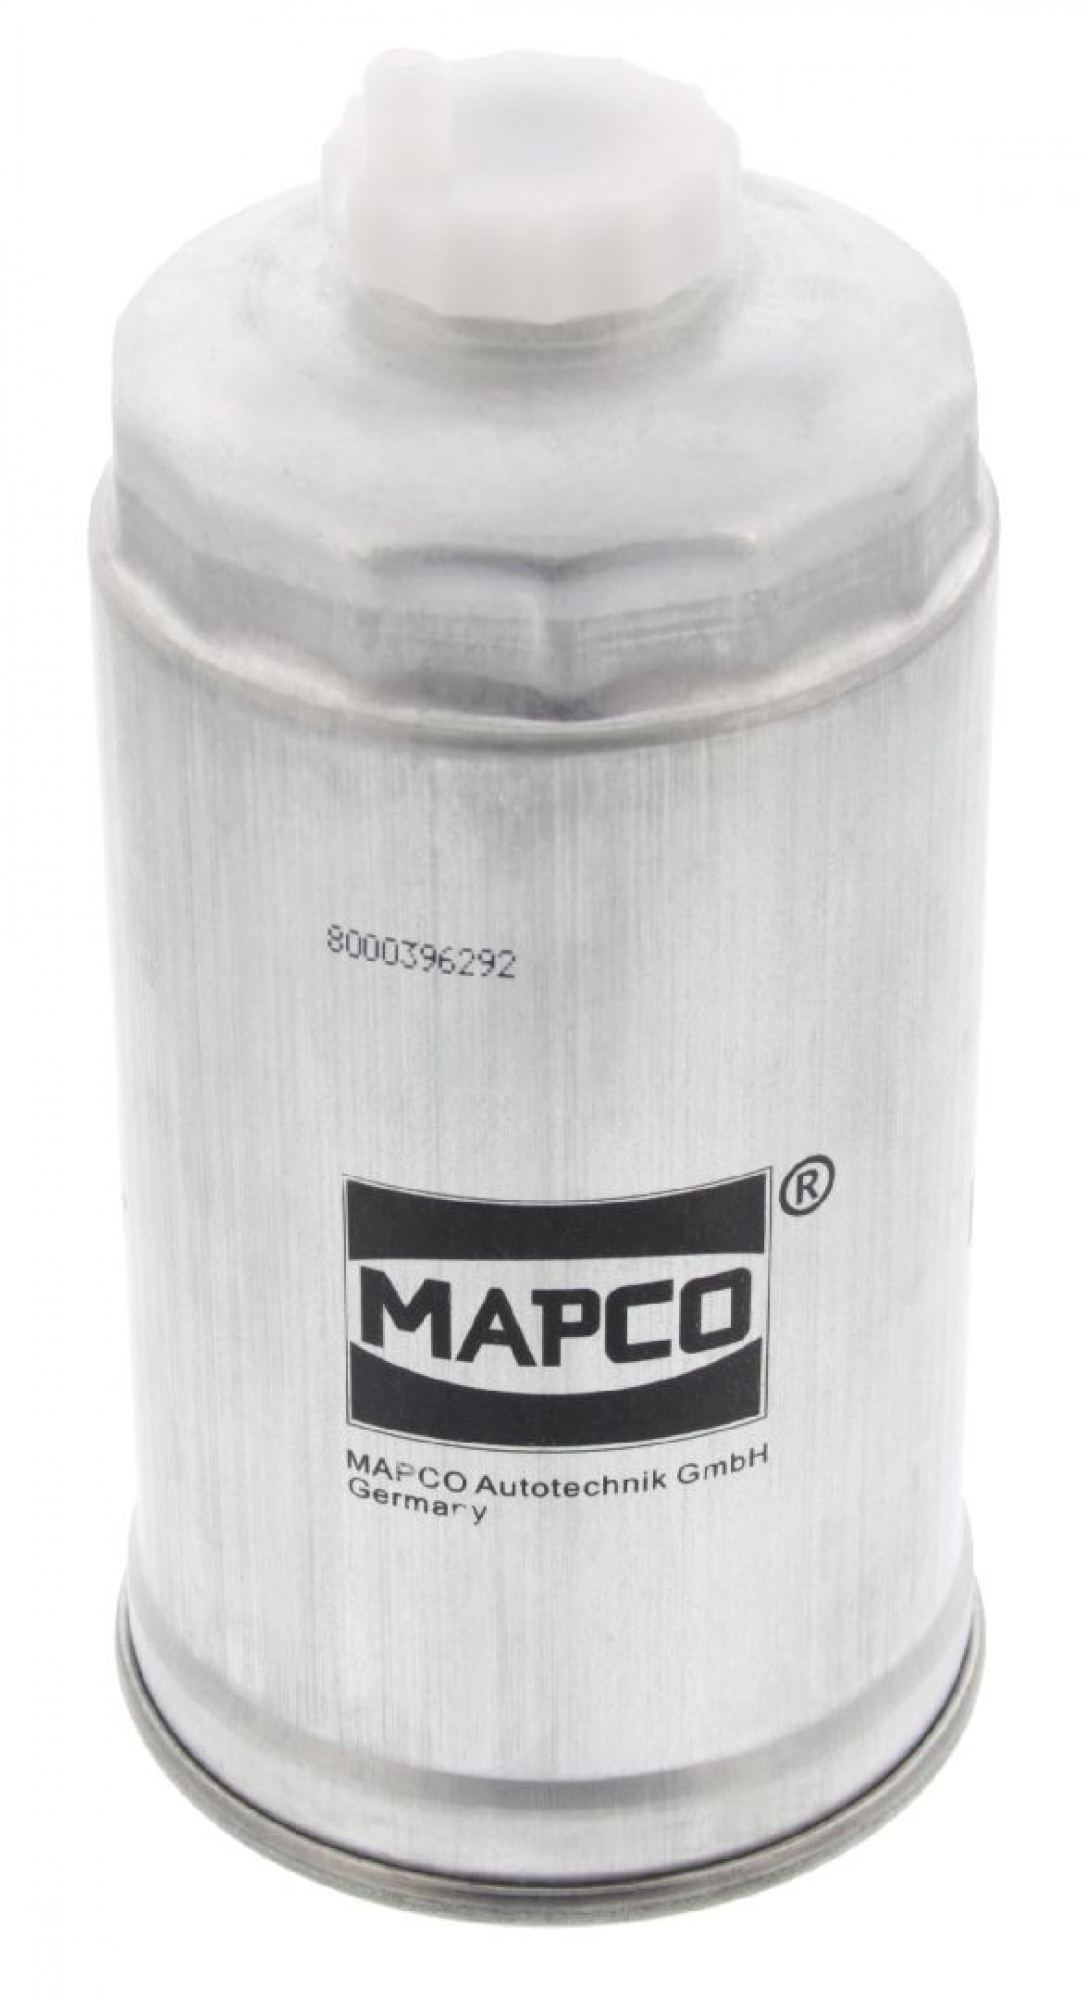 Mapco 63245 Fuel Filter 1998 Volvo S70 Location